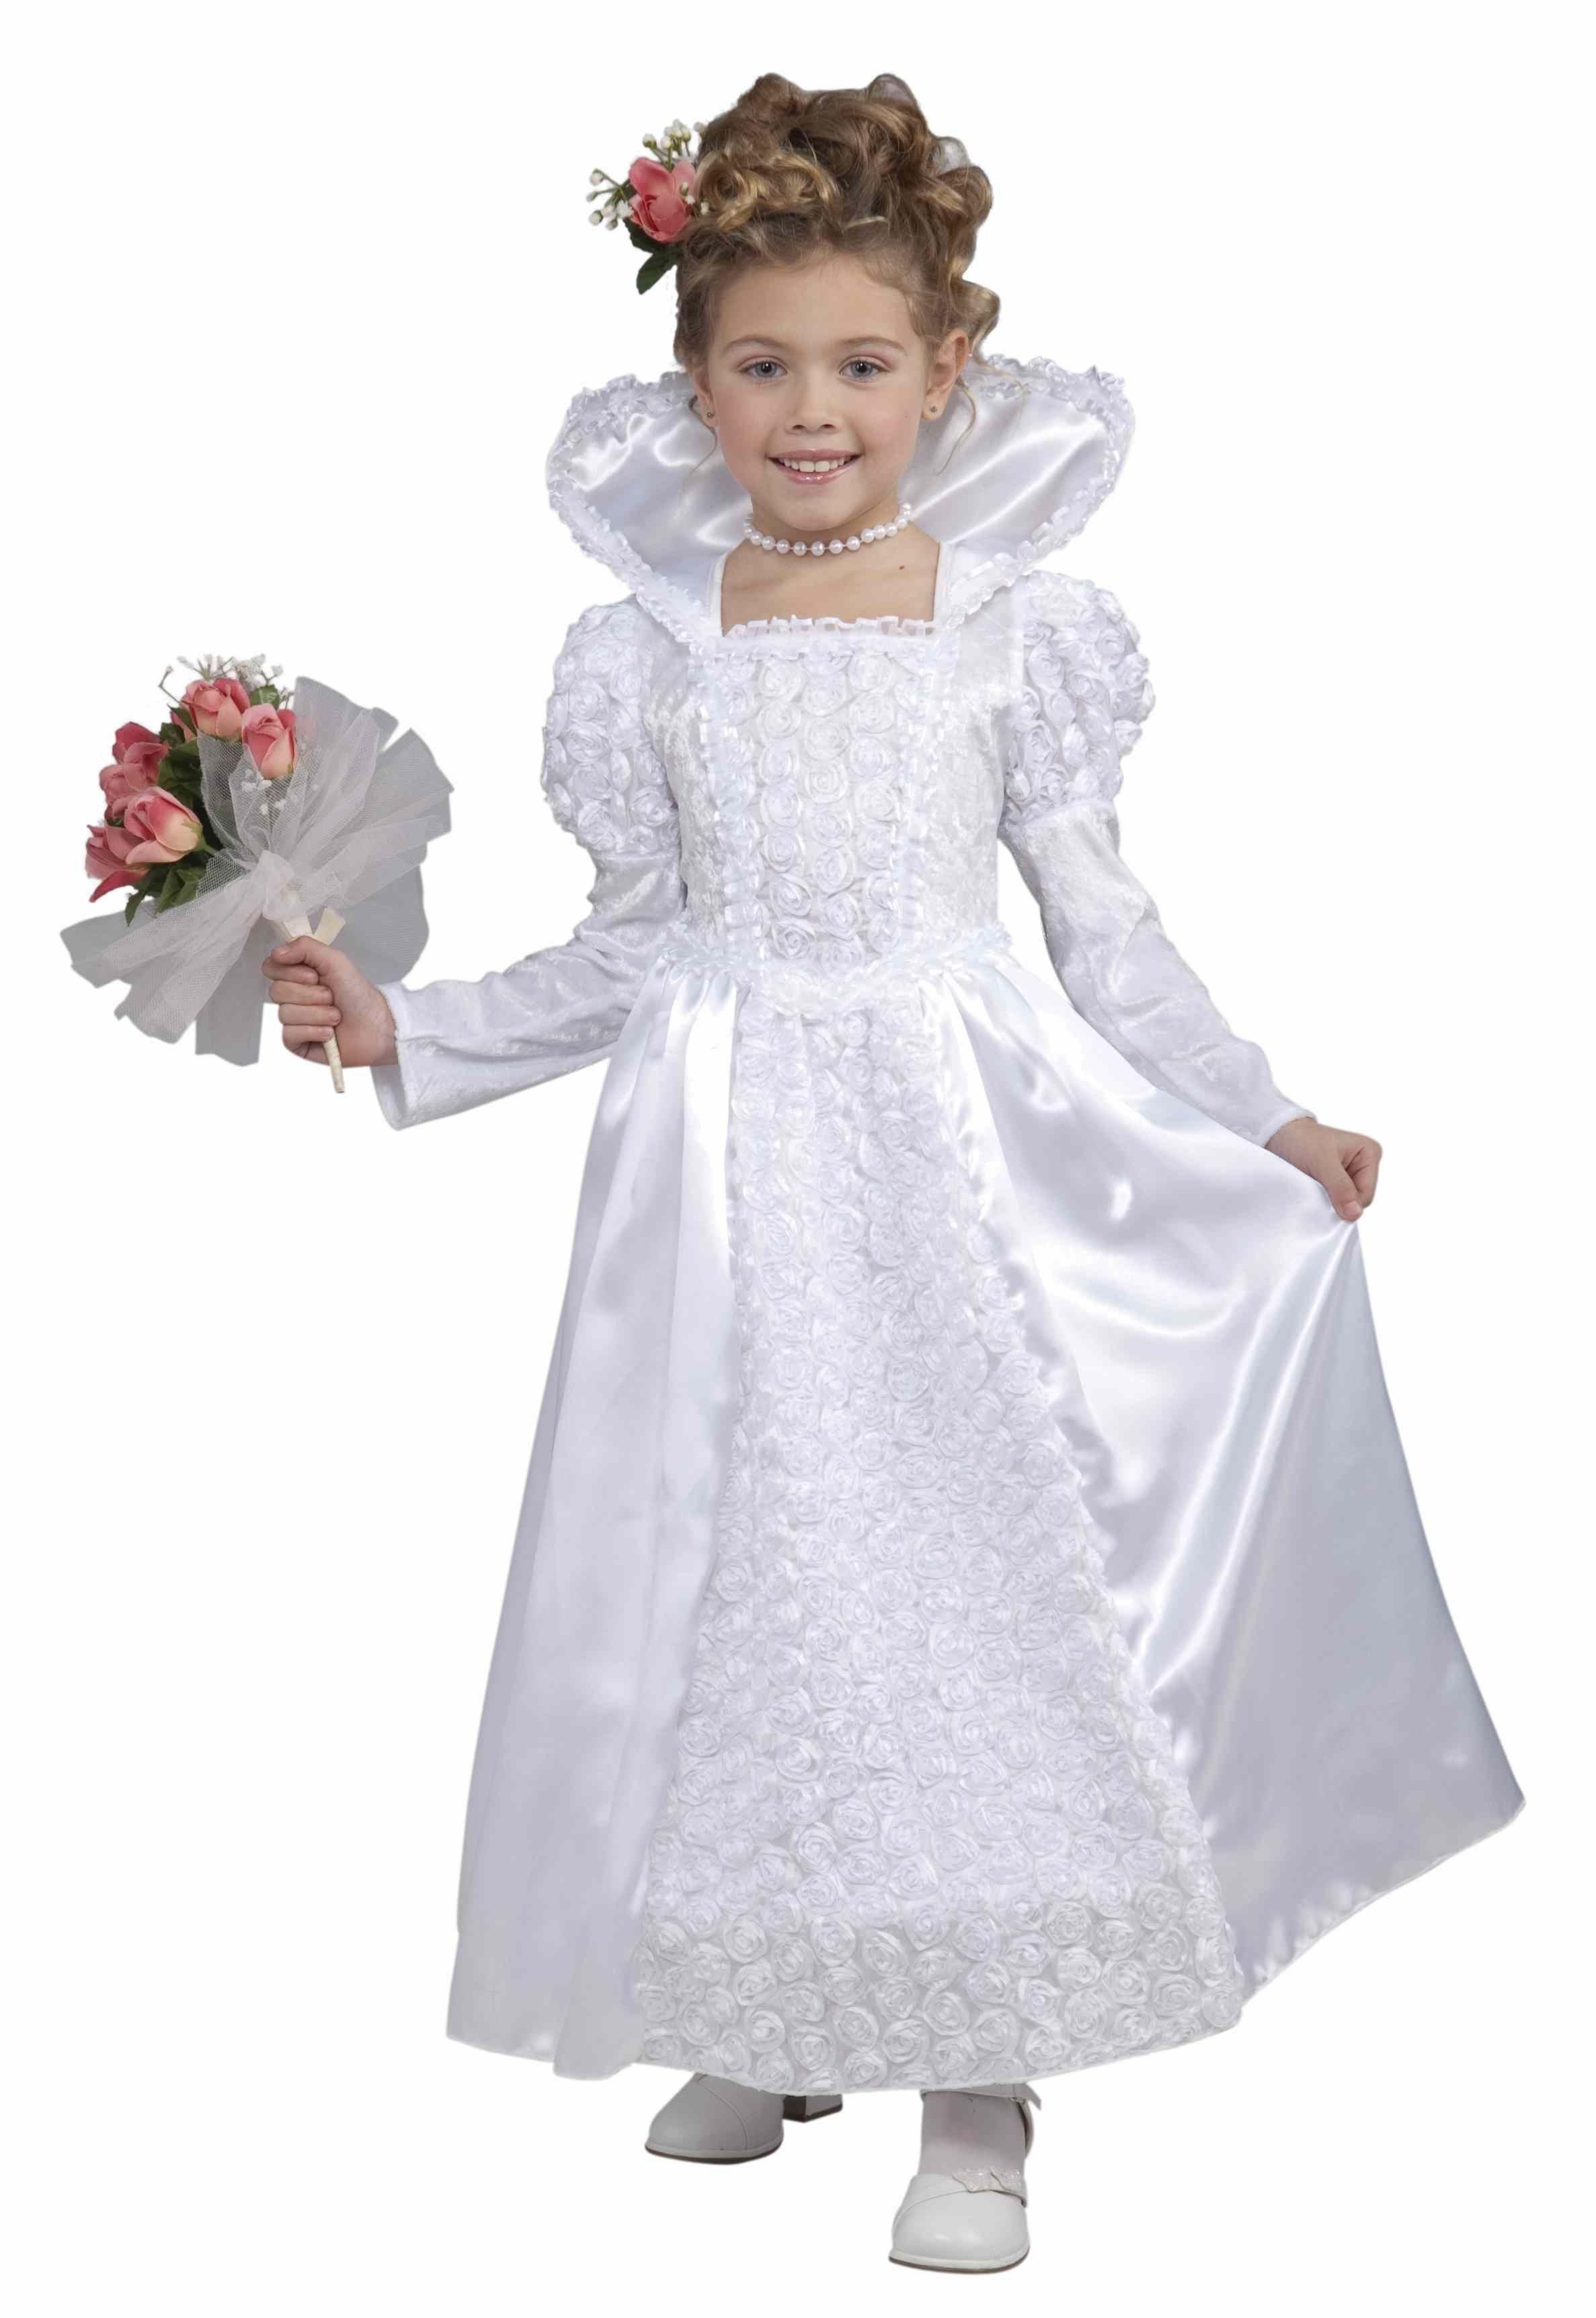 photo: On Princess Bride Girls